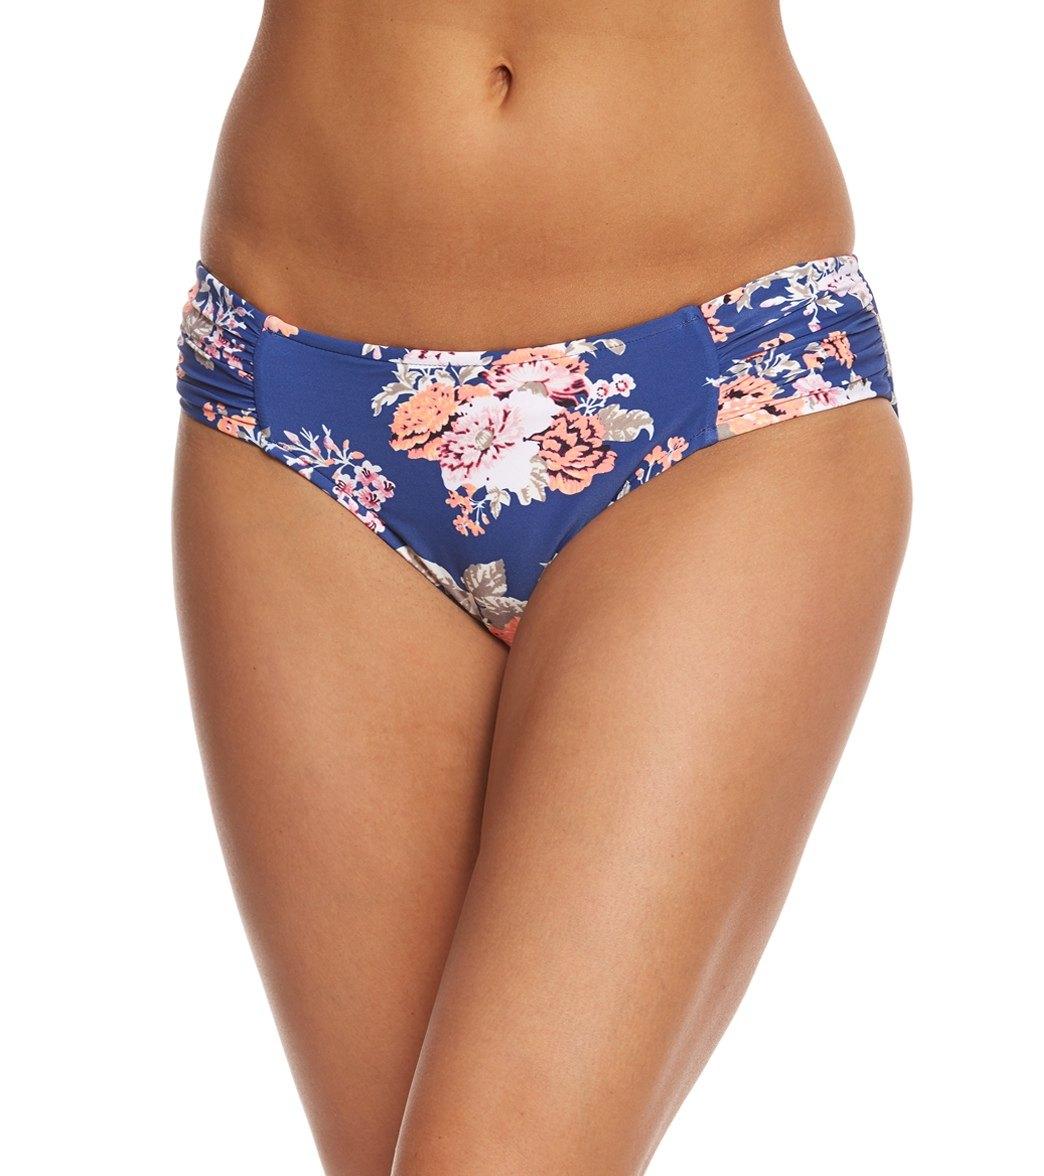 6a2e61044a Seafolly Vintage Wildflower Ruched Side Retro Bikini Bottom at ...